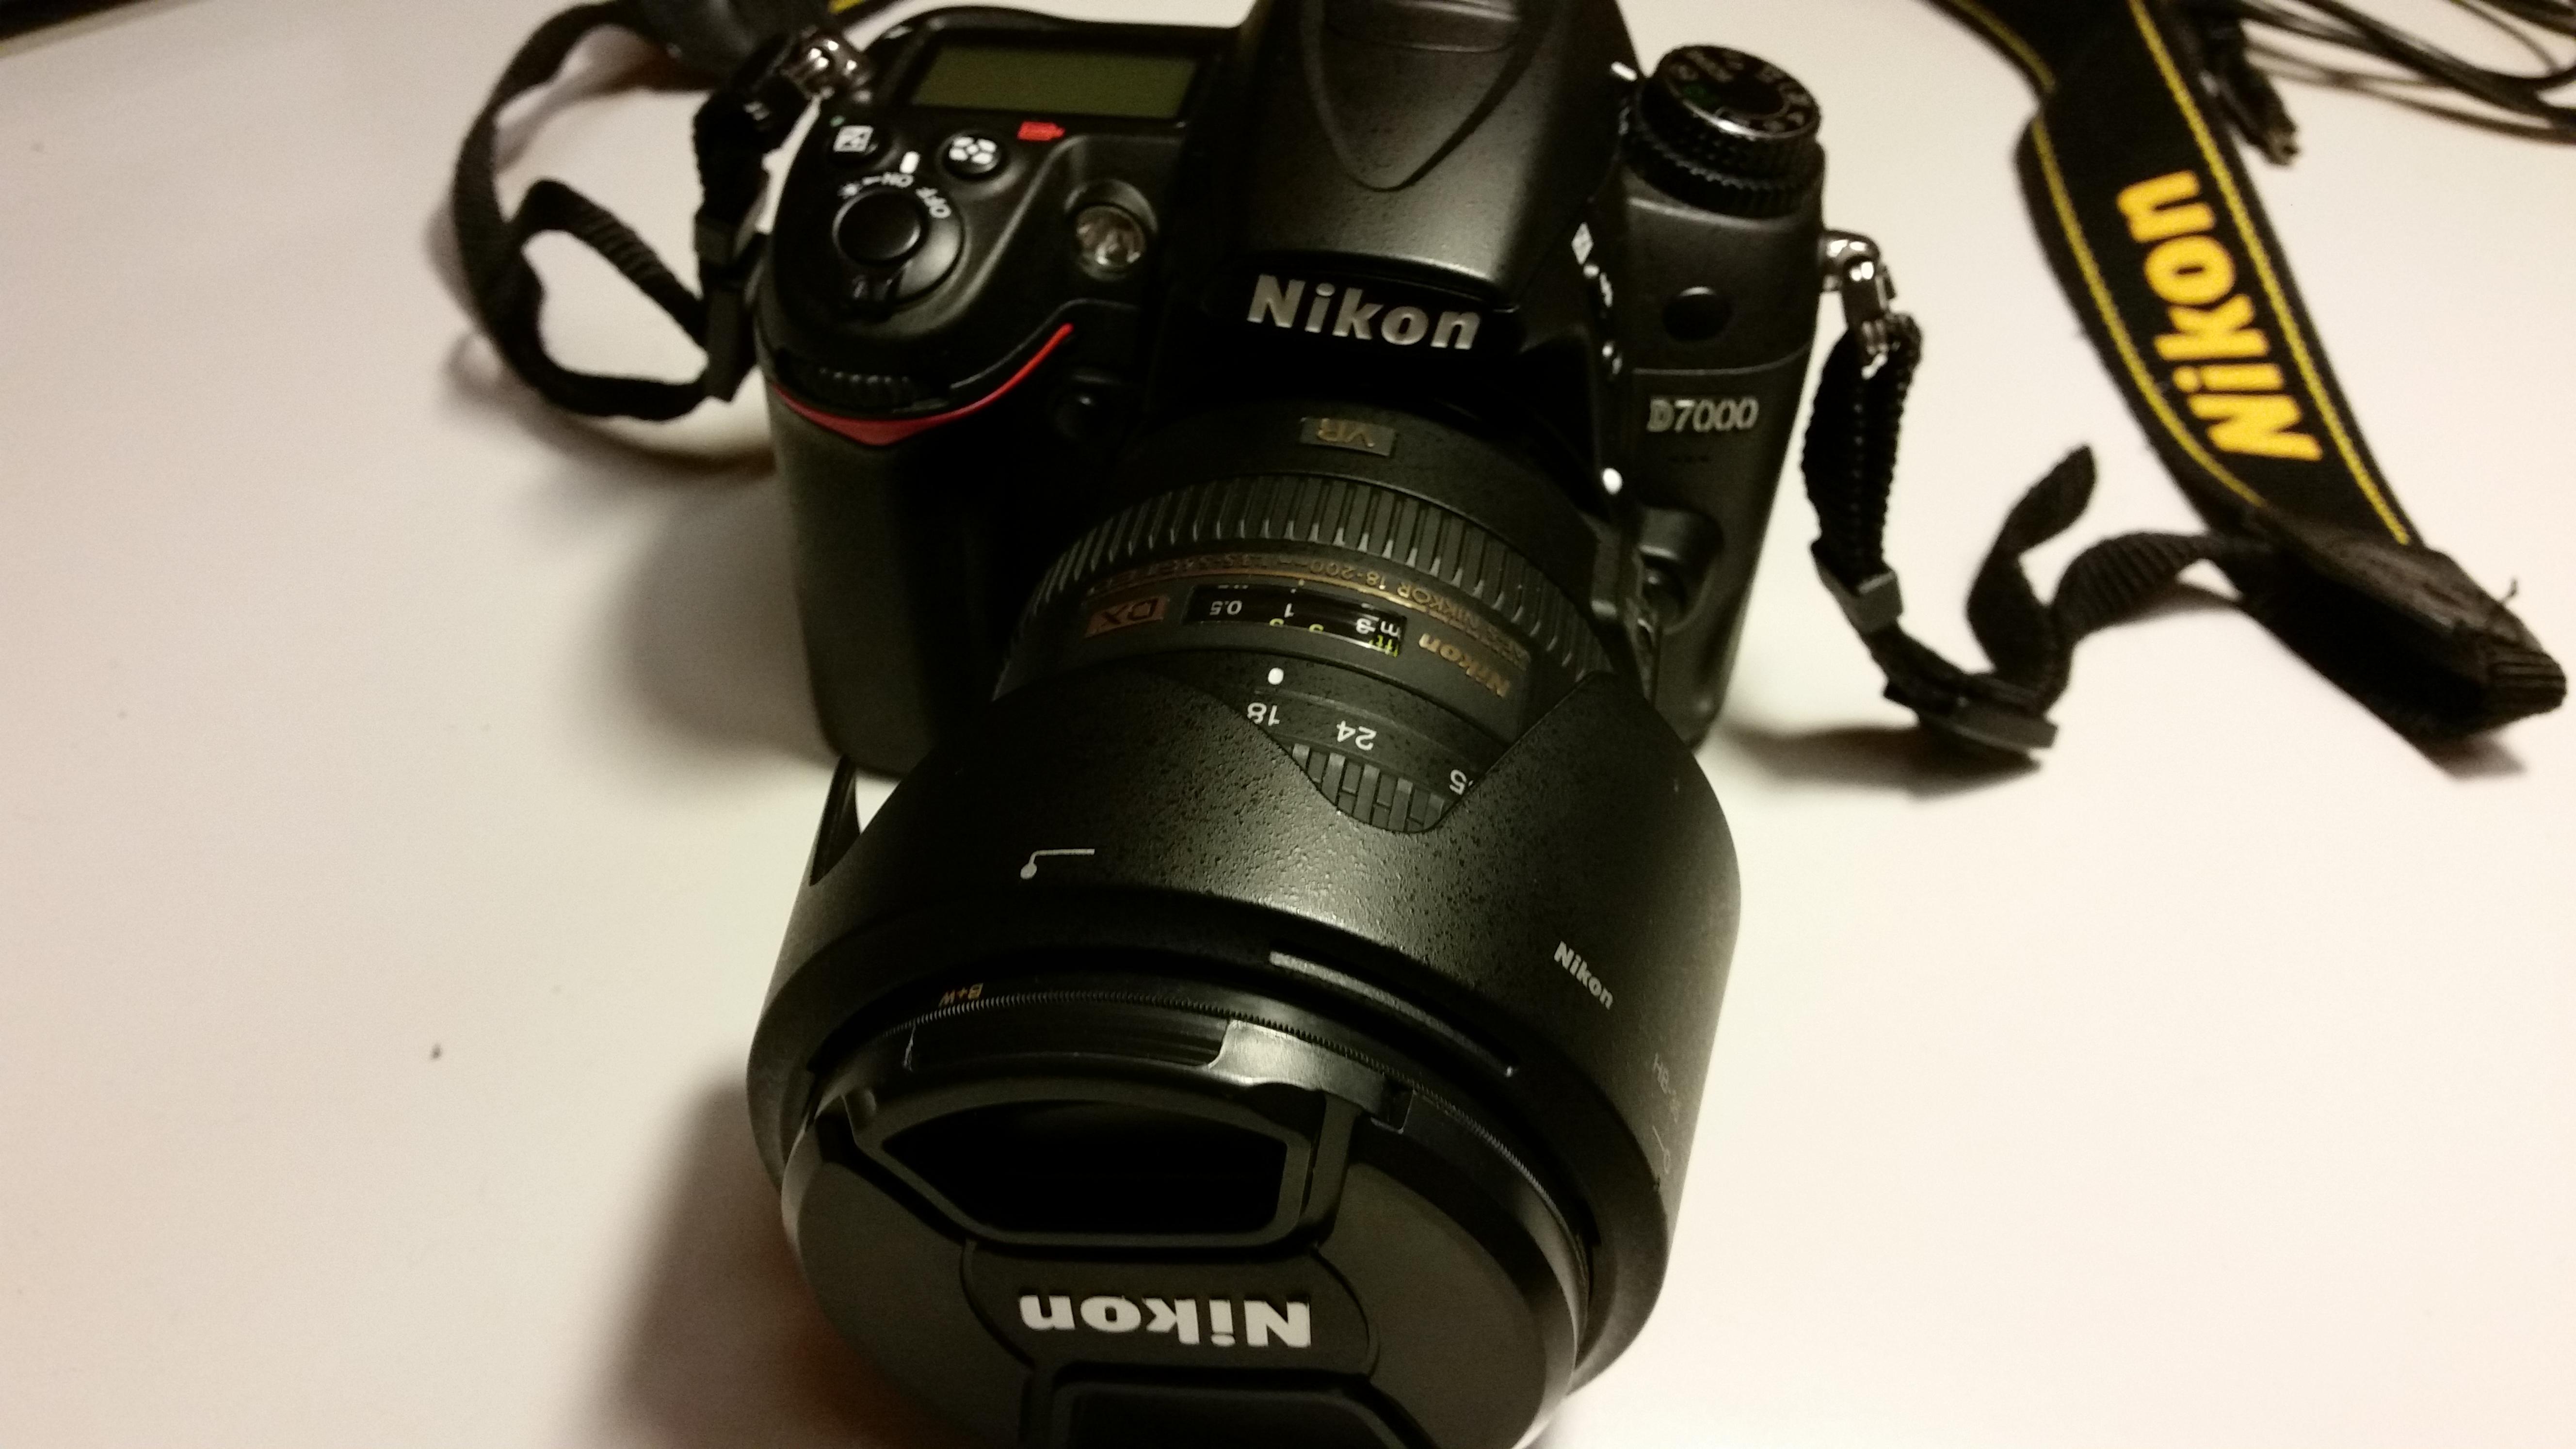 Ott Wyss Ag Fototechnik Fotobrse Eintrge Anzeigen Nikon D7100 Body Only Paket D7000 Dx Swm Vr Ed Id Aspherics 18 200mm Objektiv